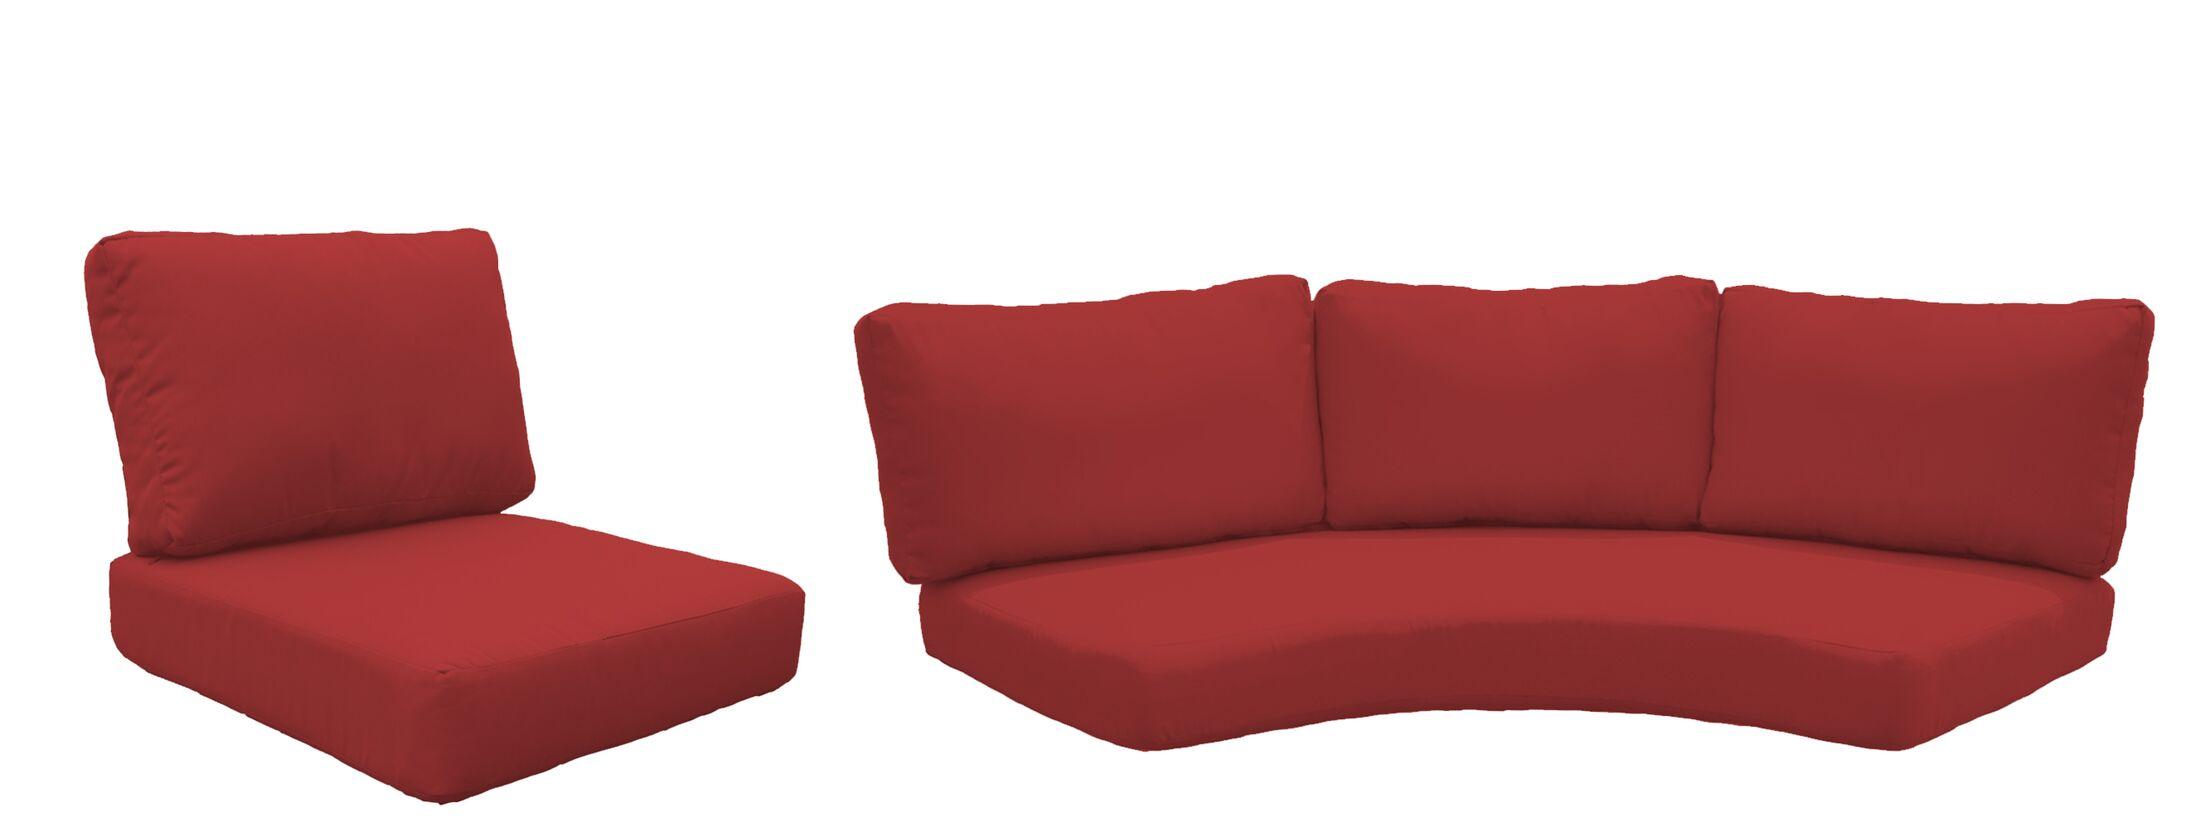 East Village Outdoor 14 Piece Lounge Chair Cushion Set Fabric: Terracotta